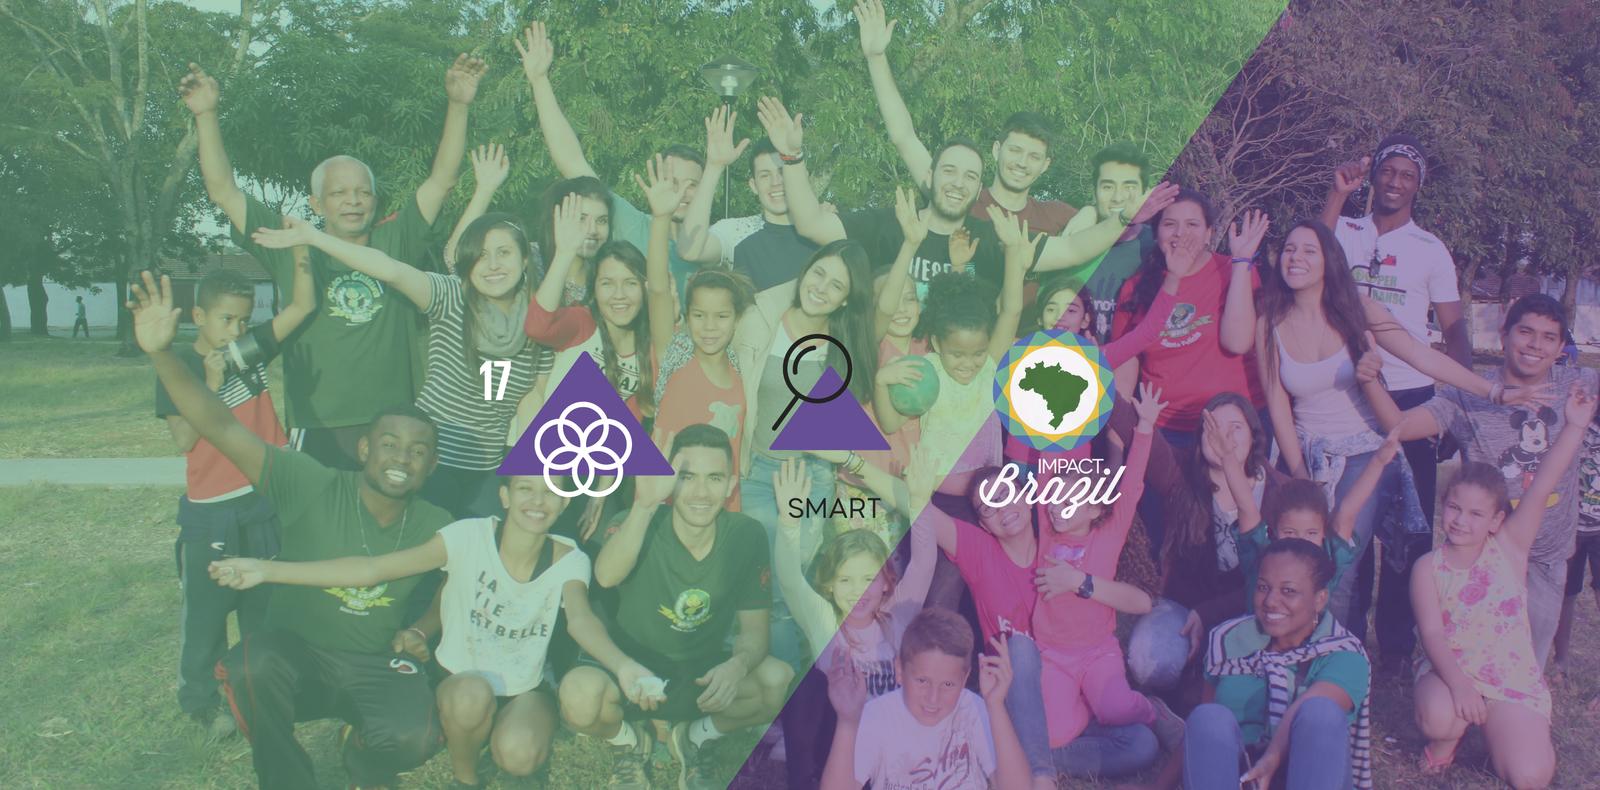 SMART: Marketing & Management in São Carlos